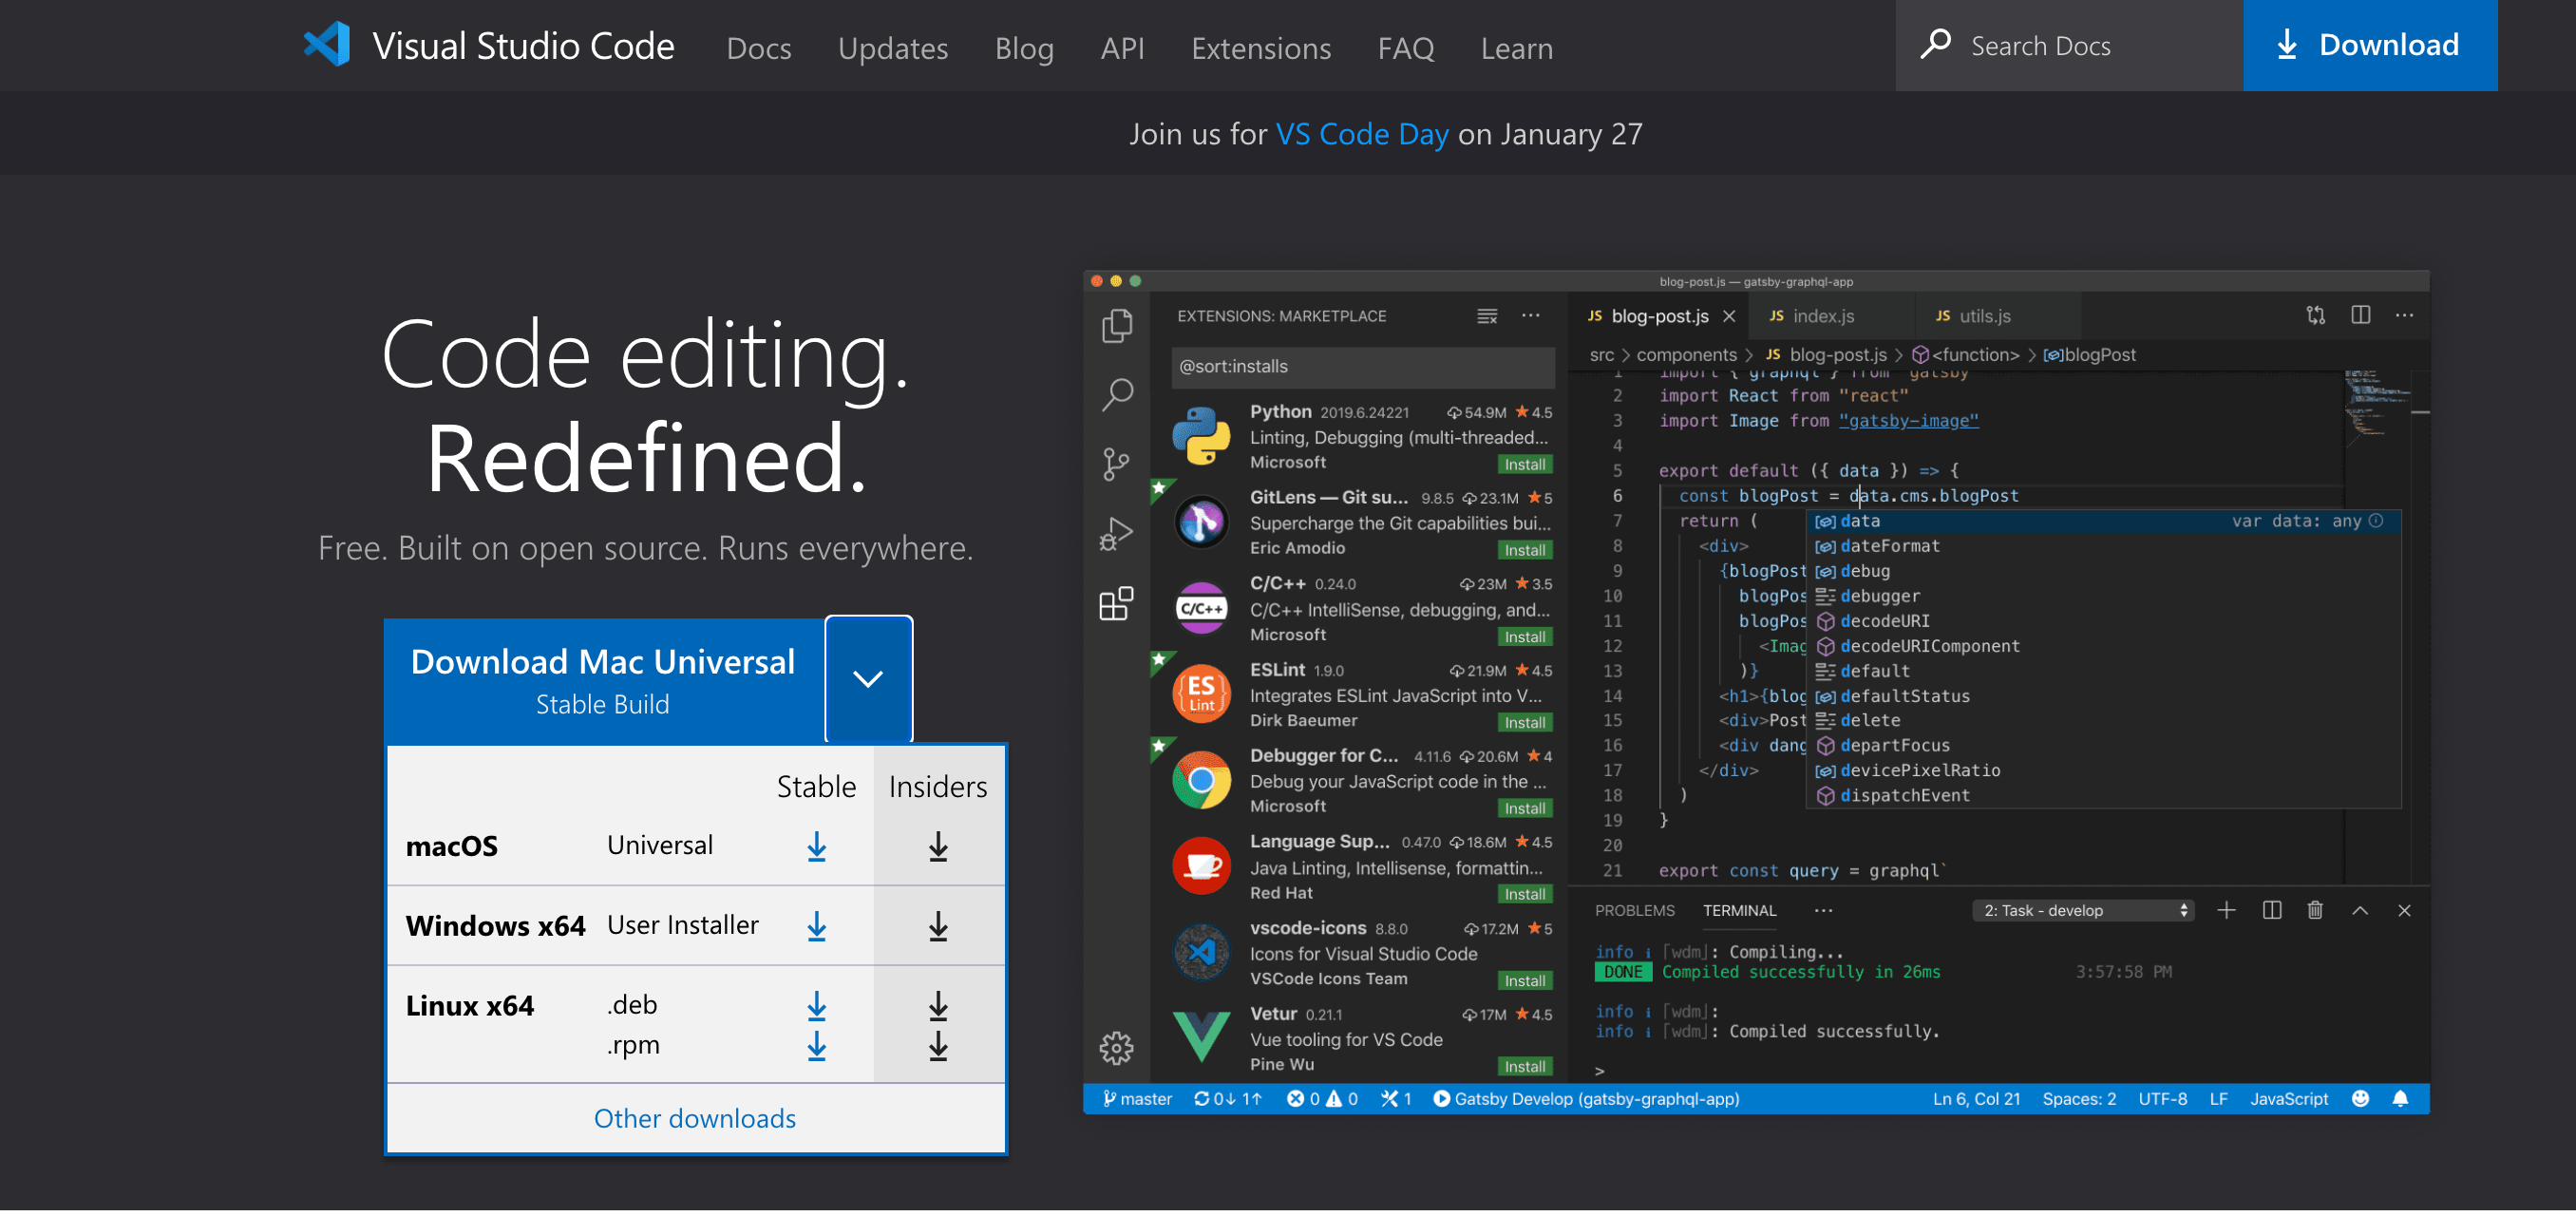 Website showing the default download for macOS